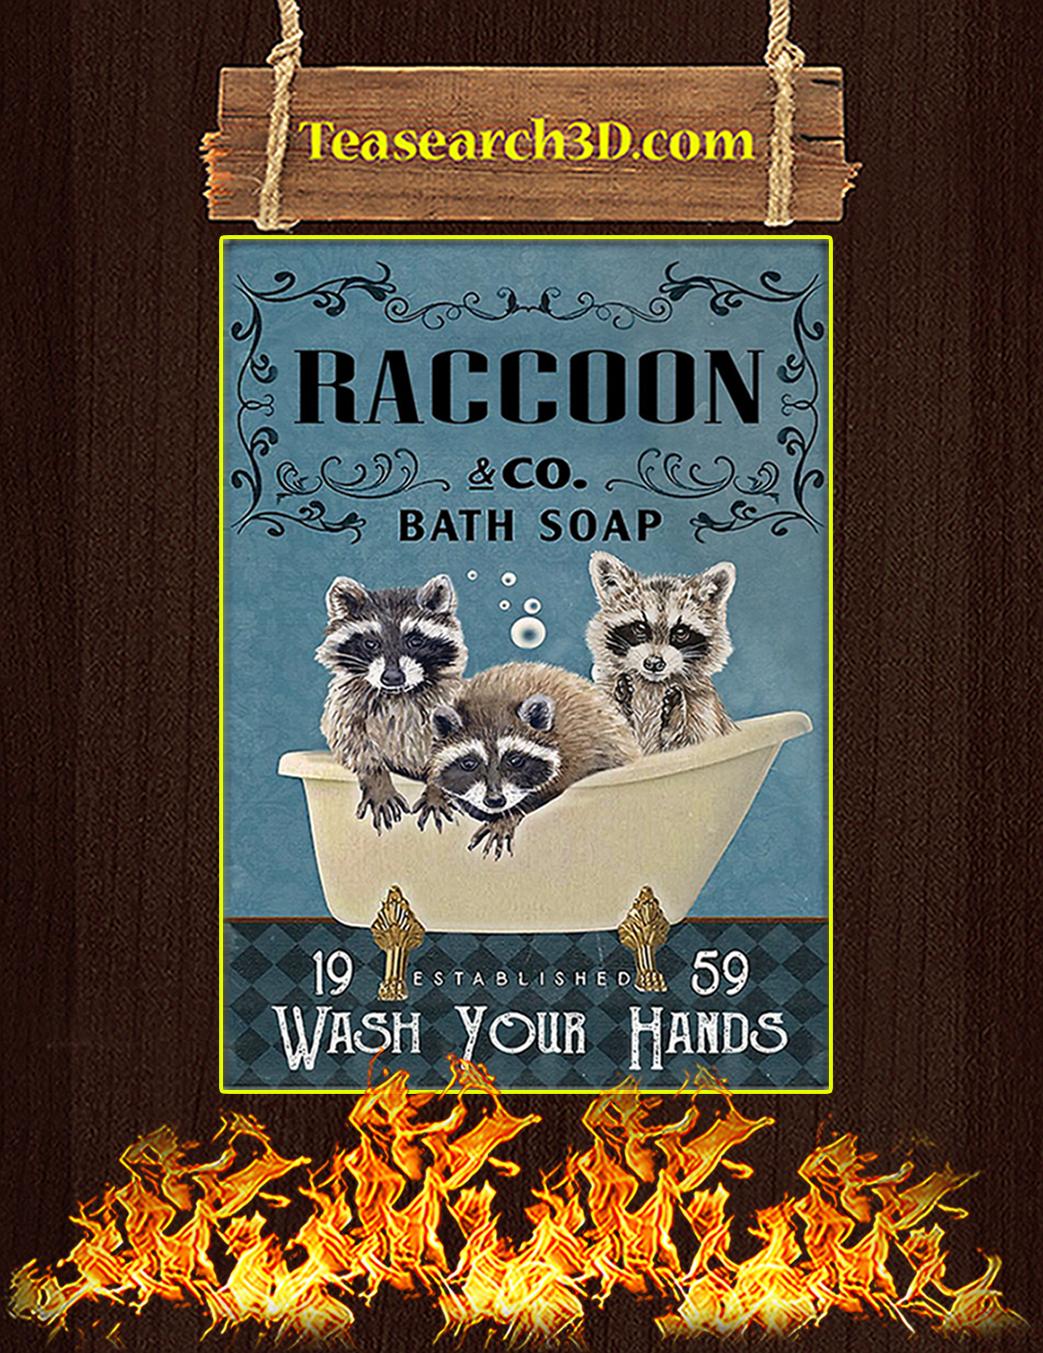 Raccoon Company Bath Soap Poster A1